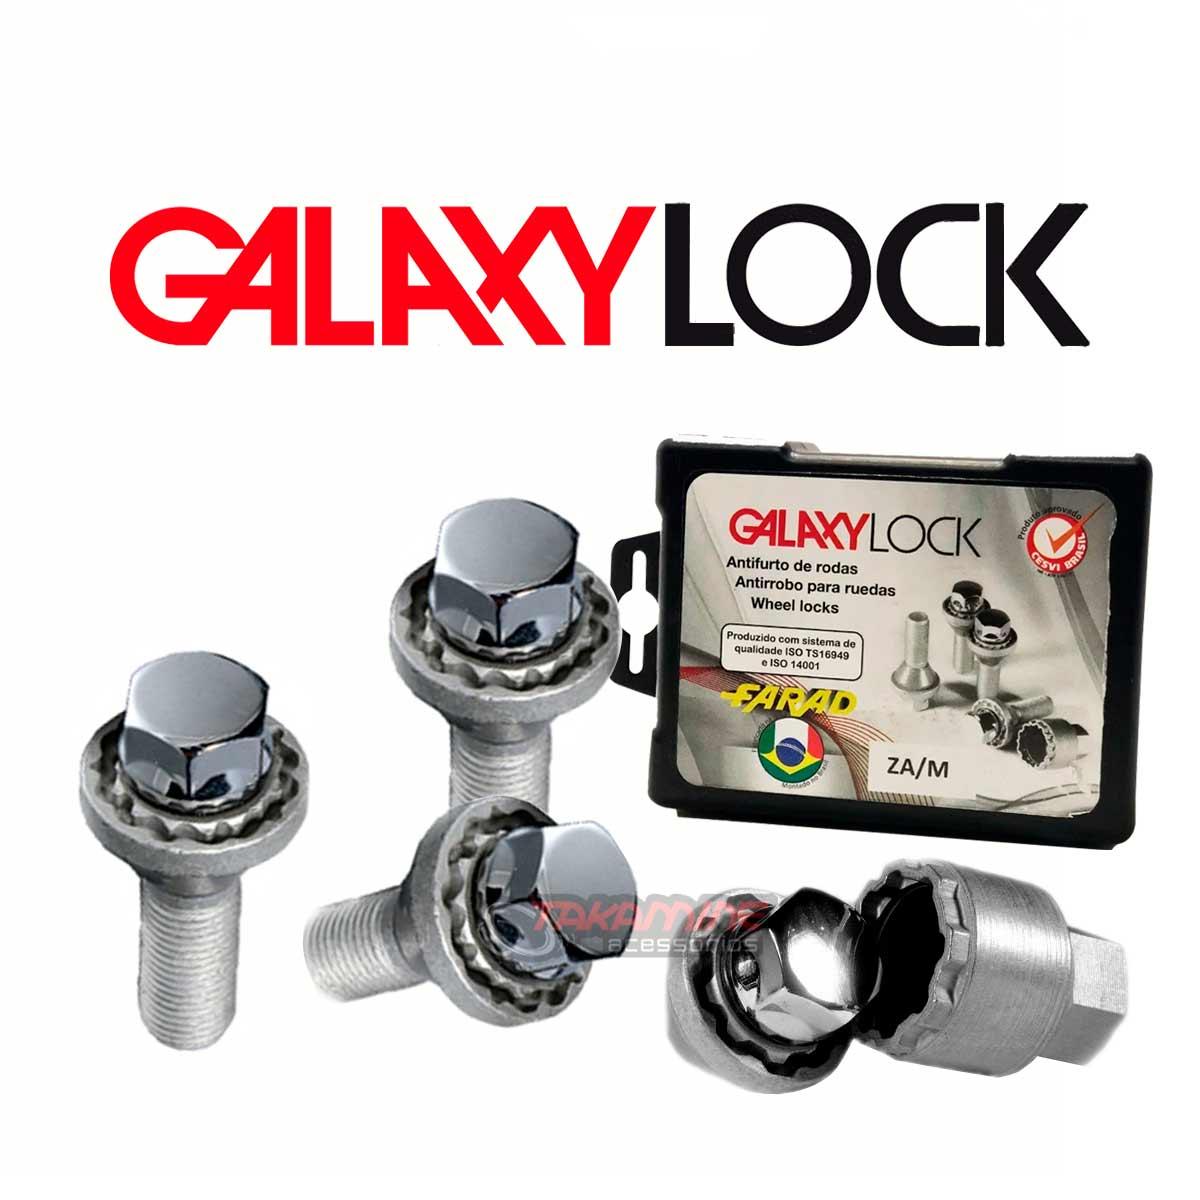 Parafuso antifurto para rodas Galaxy Lock UP 2014 até 2020 (roda de liga) L2/M